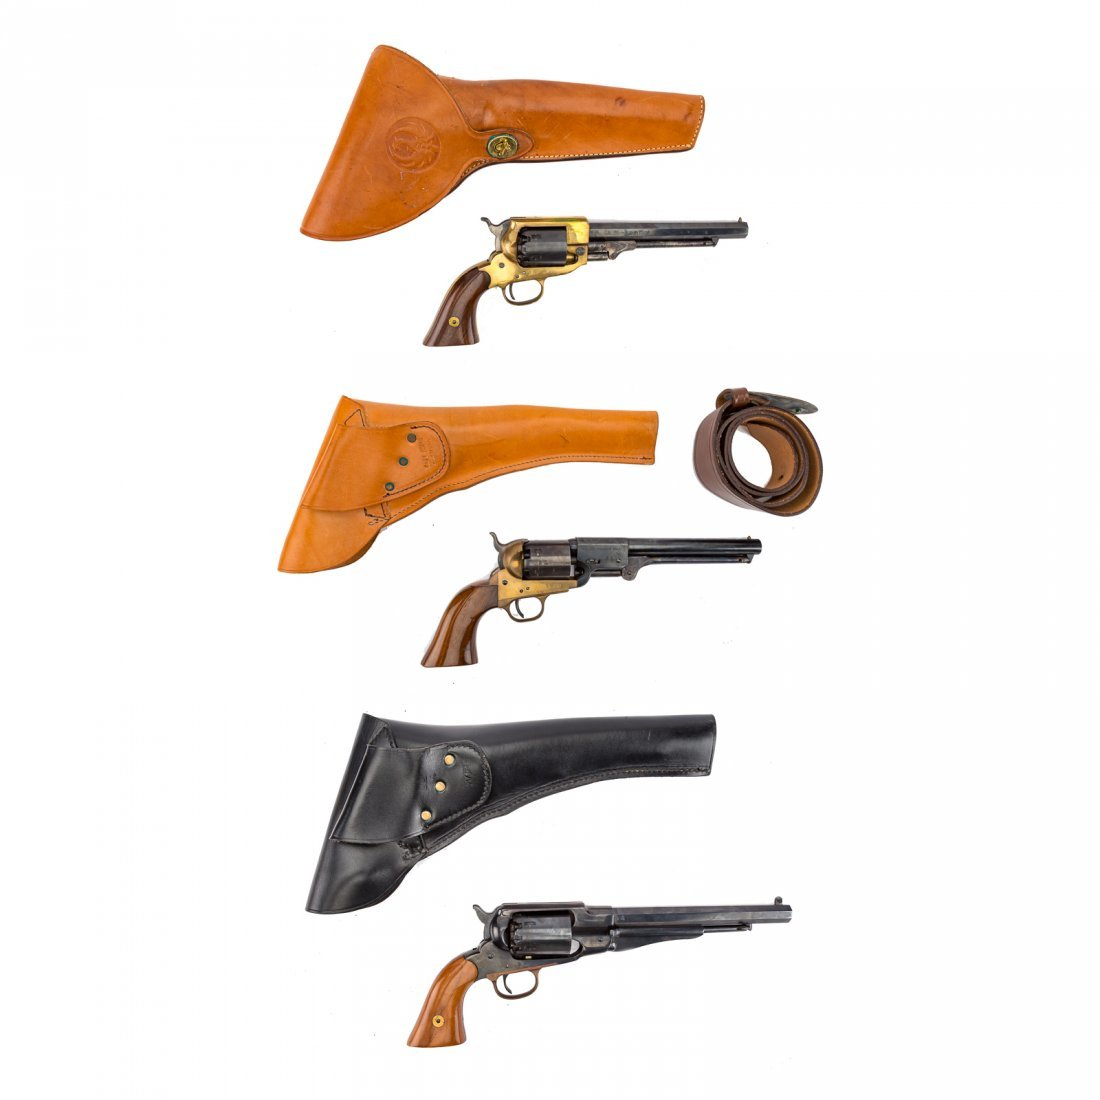 Three Italian repro. Civil War style revolvers